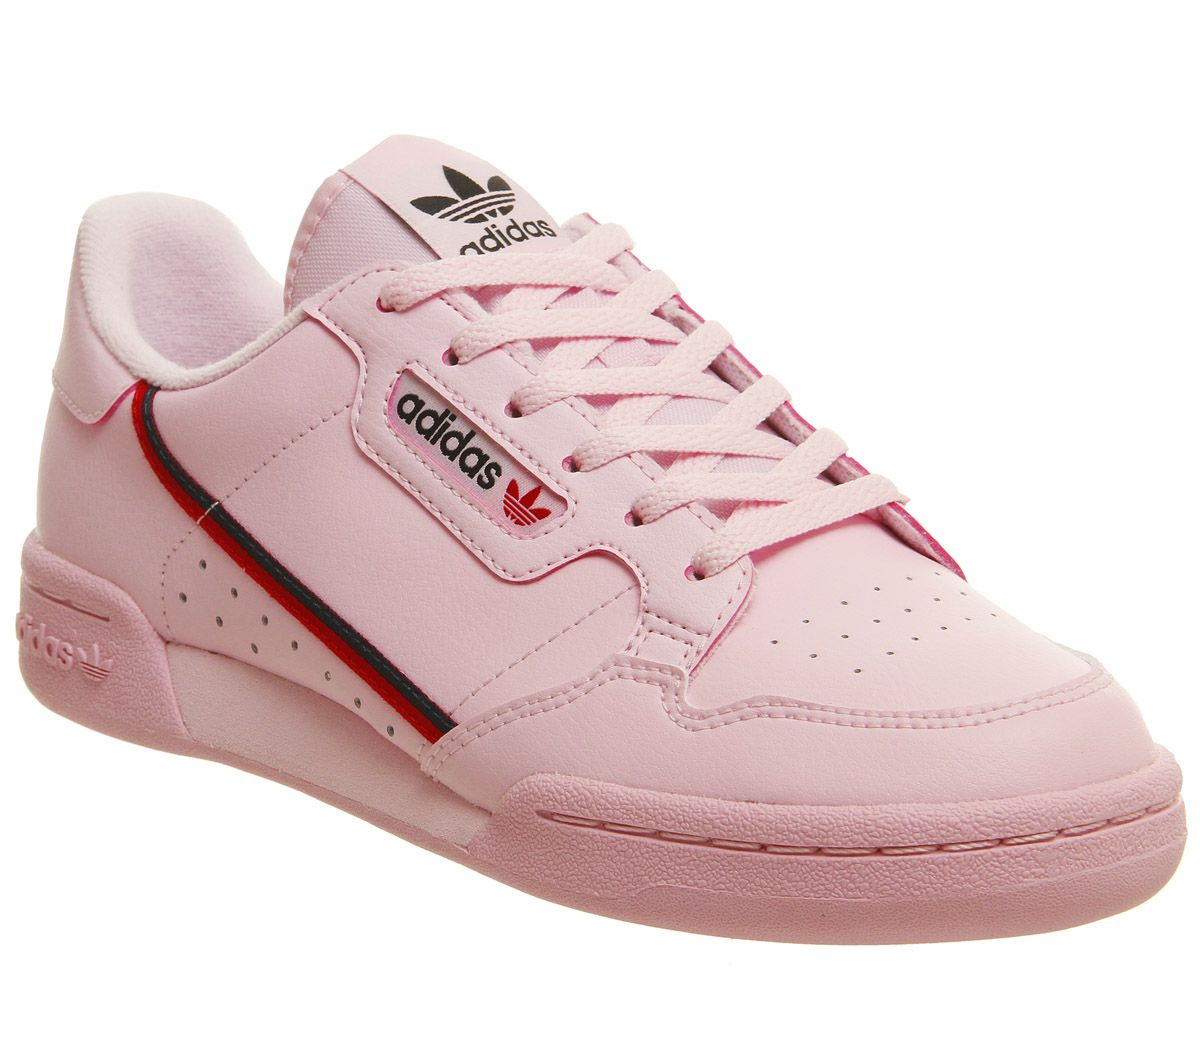 adidas scarpe rosa